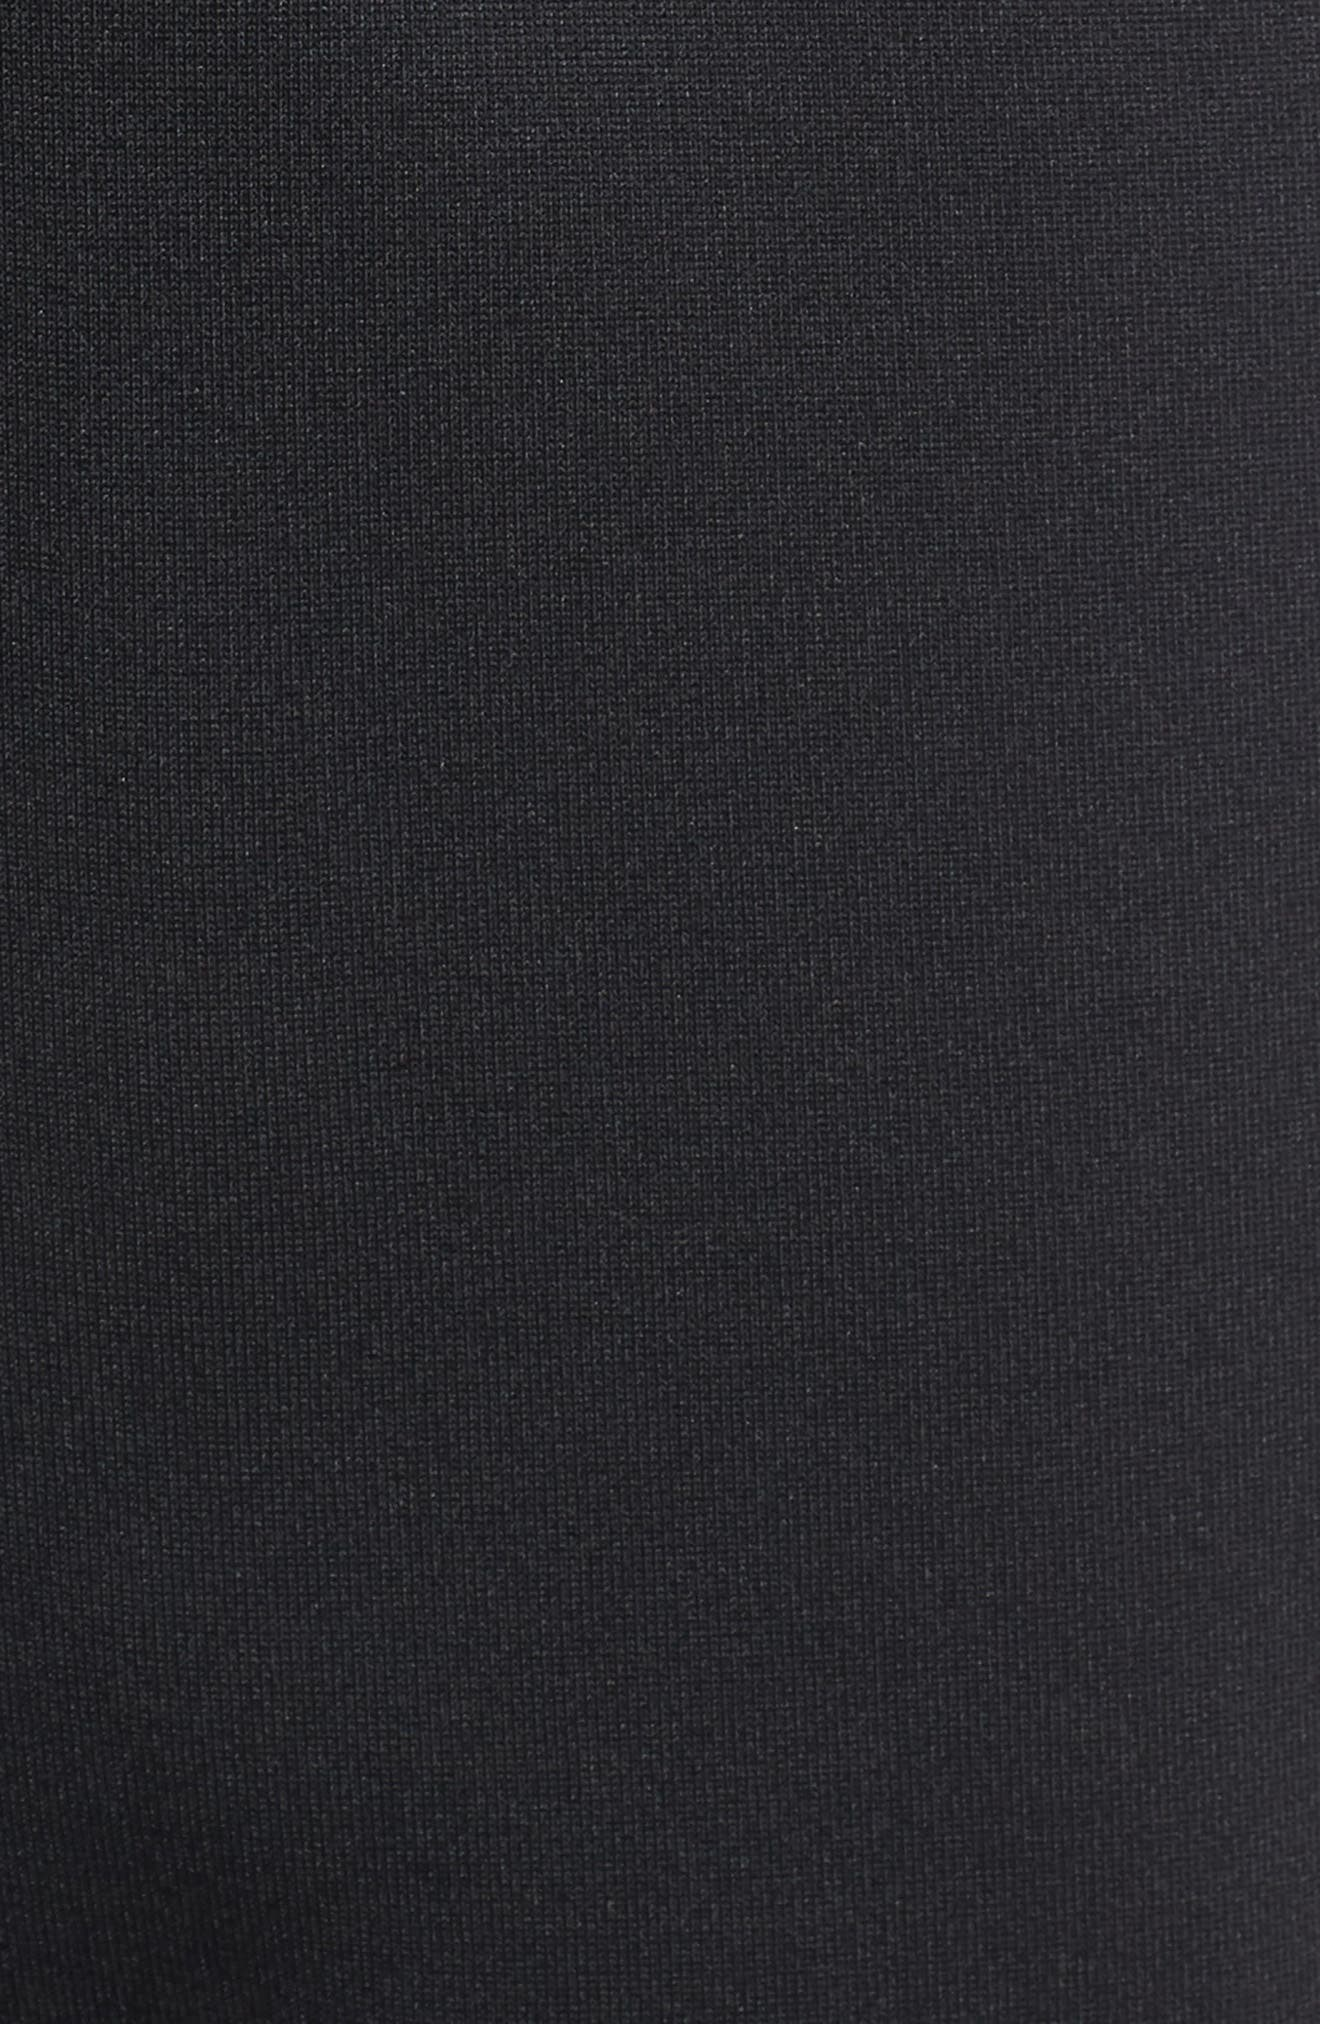 Sportswear Air Max Shorts,                             Alternate thumbnail 5, color,                             010